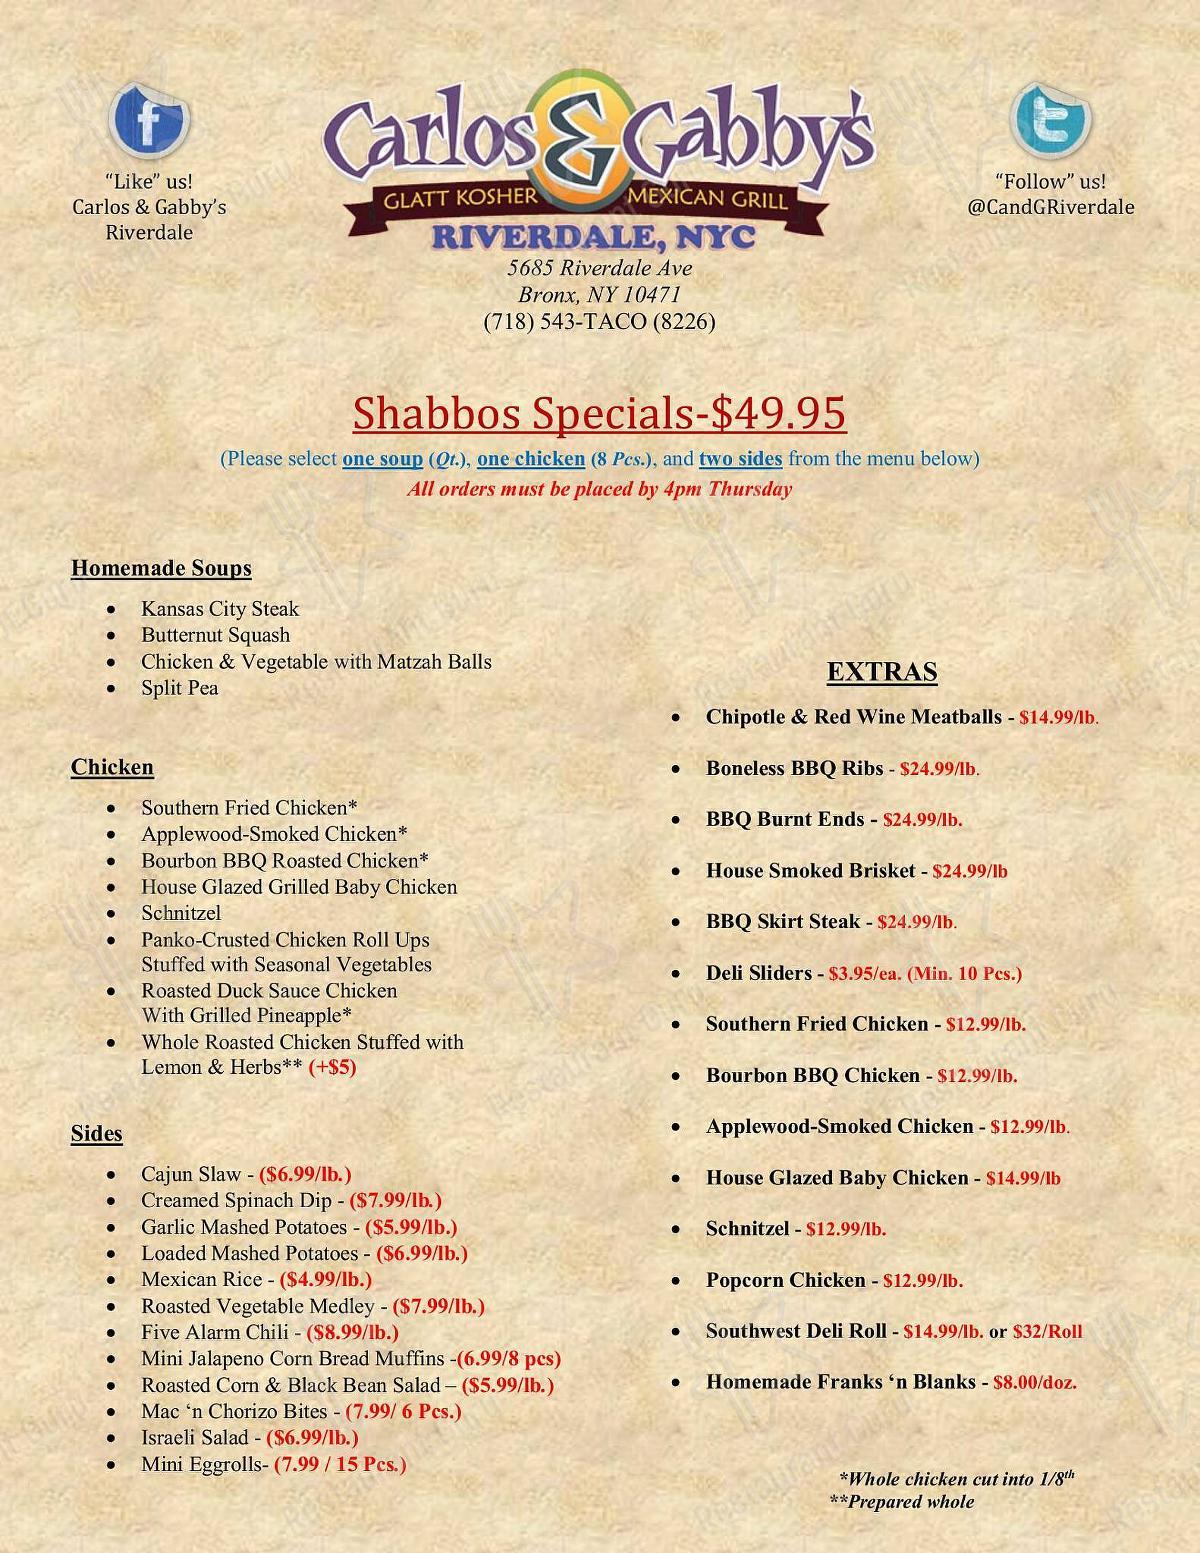 Carlos and Gabby's menu